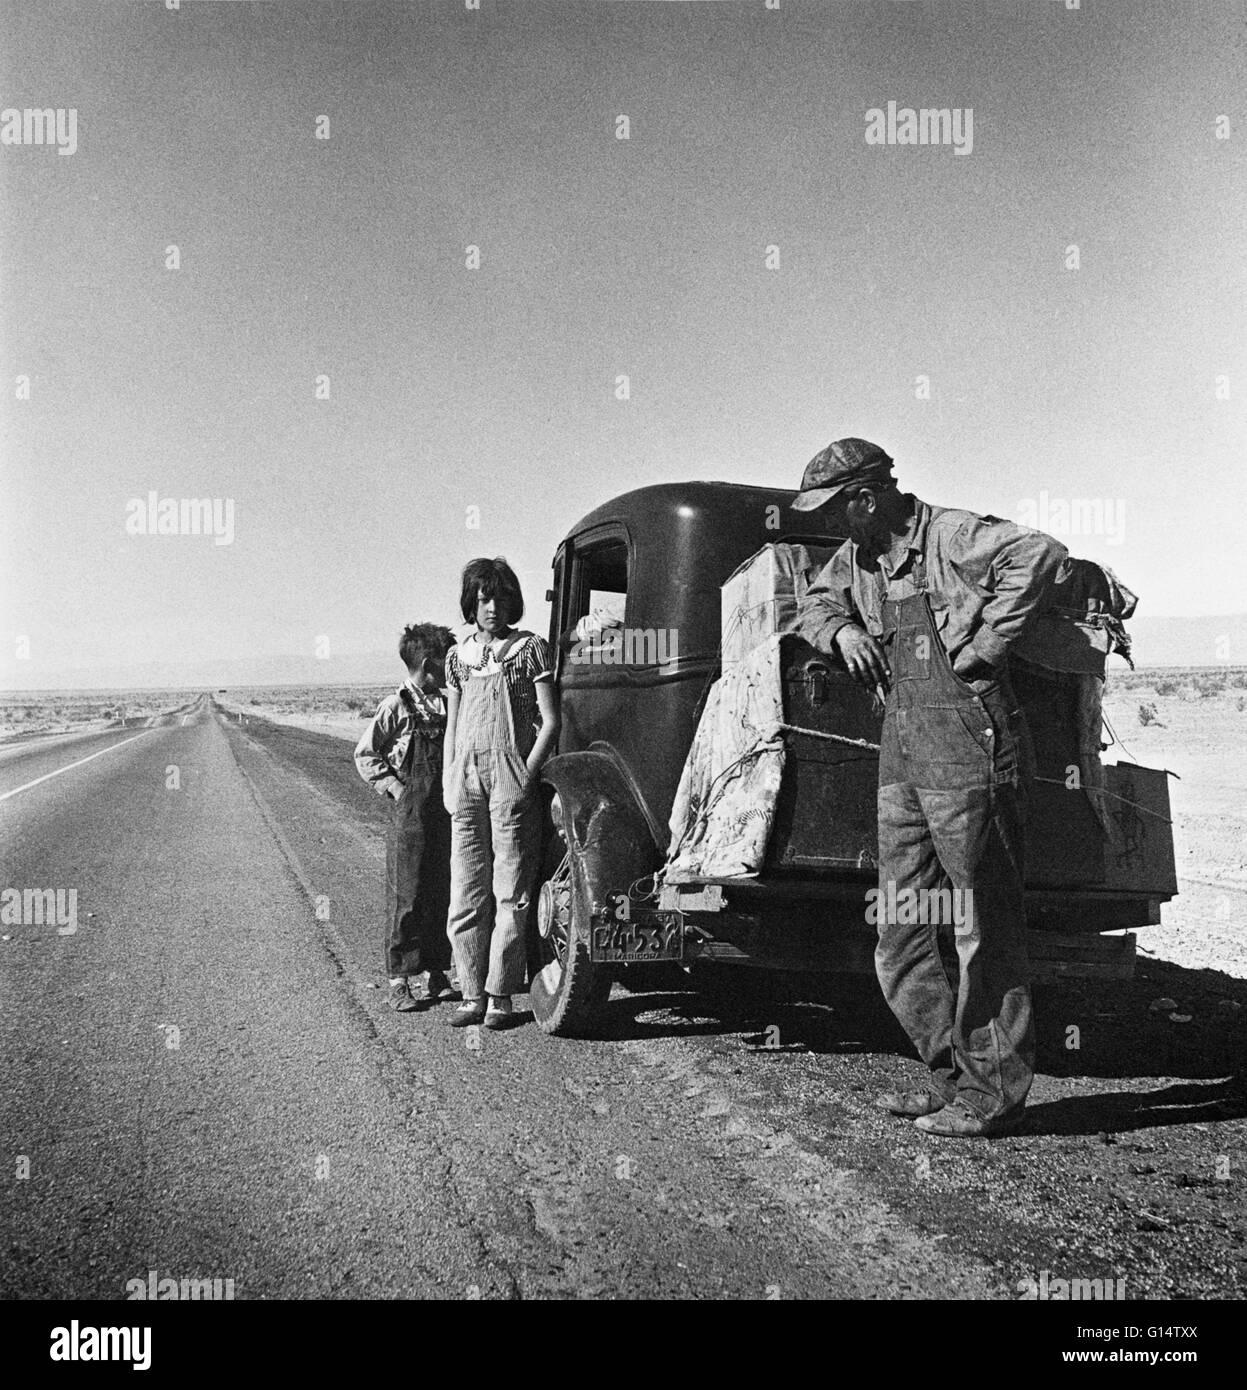 'Entering the California Desert,' by Dorothea Lange, a depression-era Farm Security Administration photographer - Stock Image